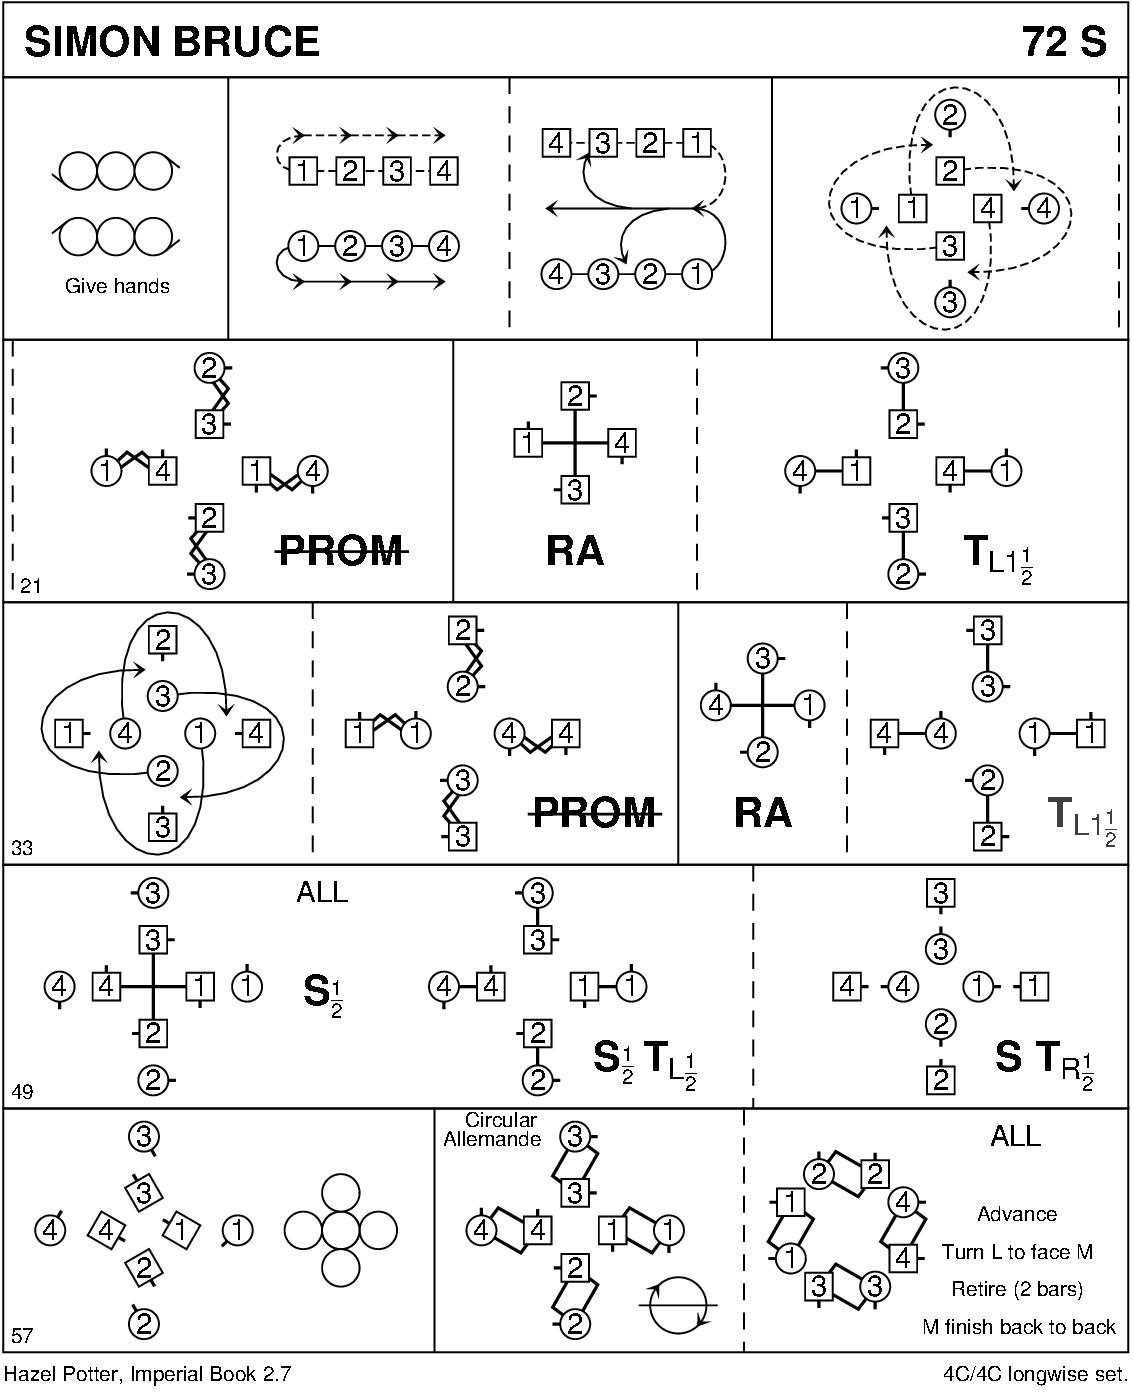 Simon Bruce Keith Rose's Diagram